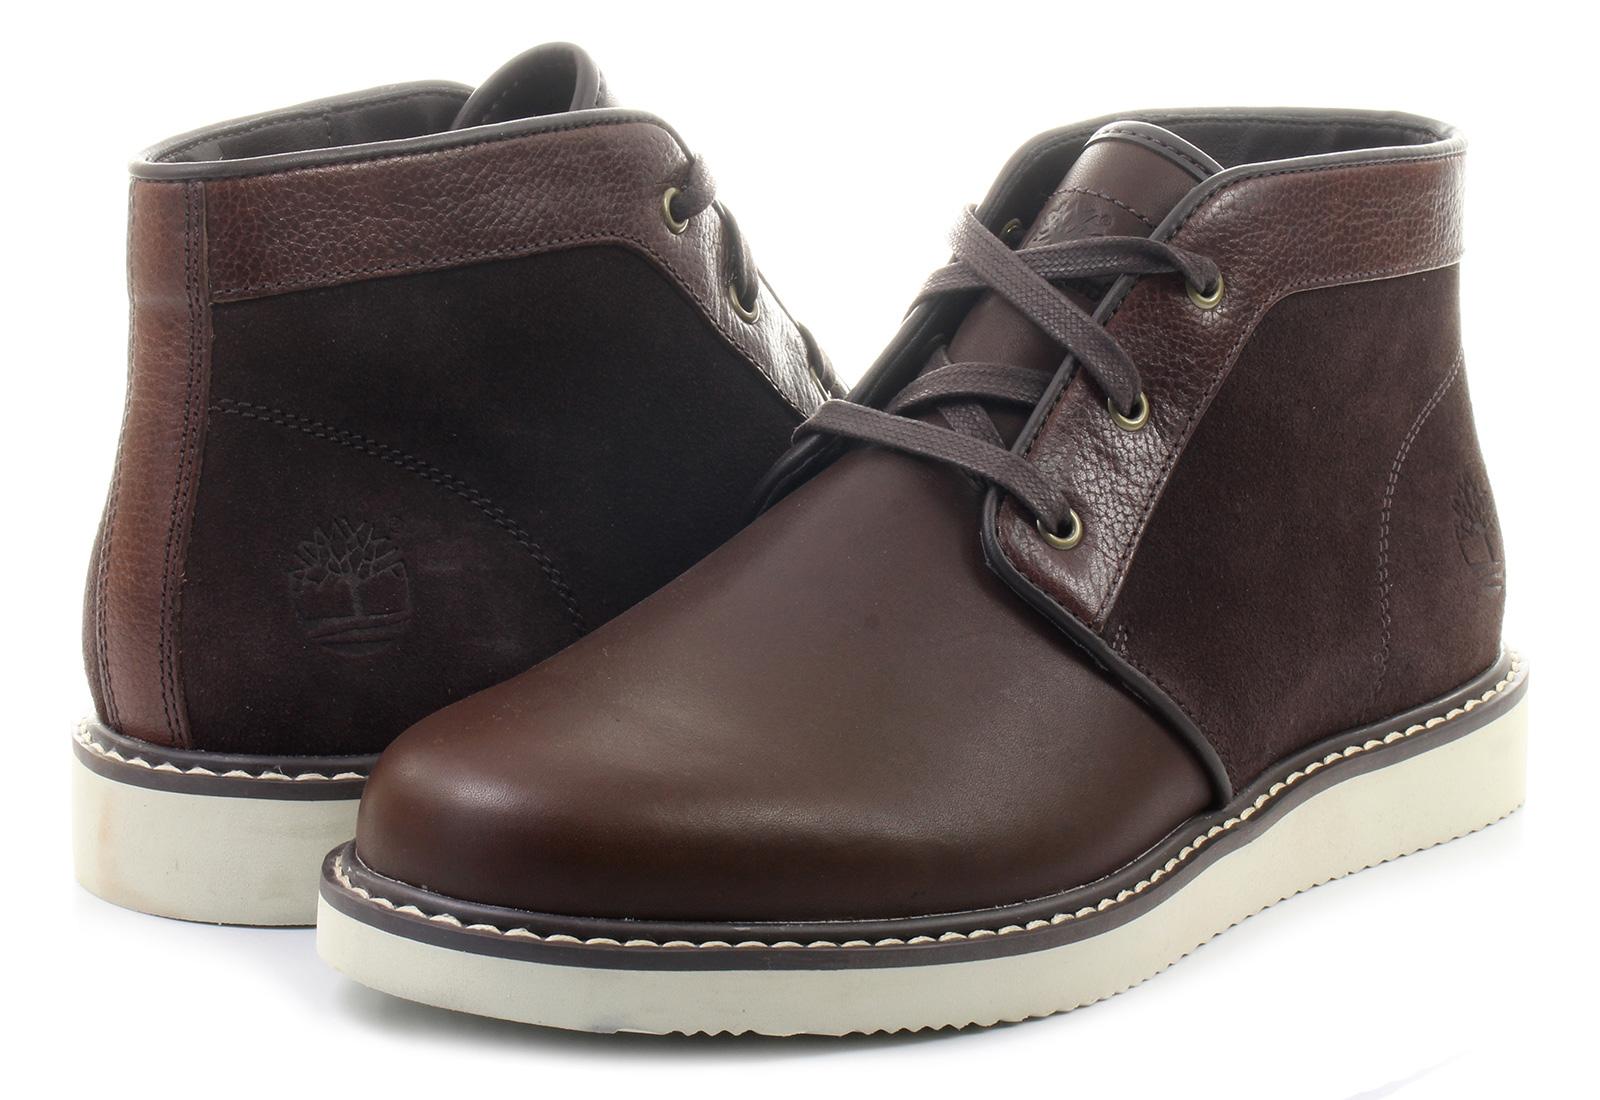 timberland shoes newmarket chukka a11oz brn